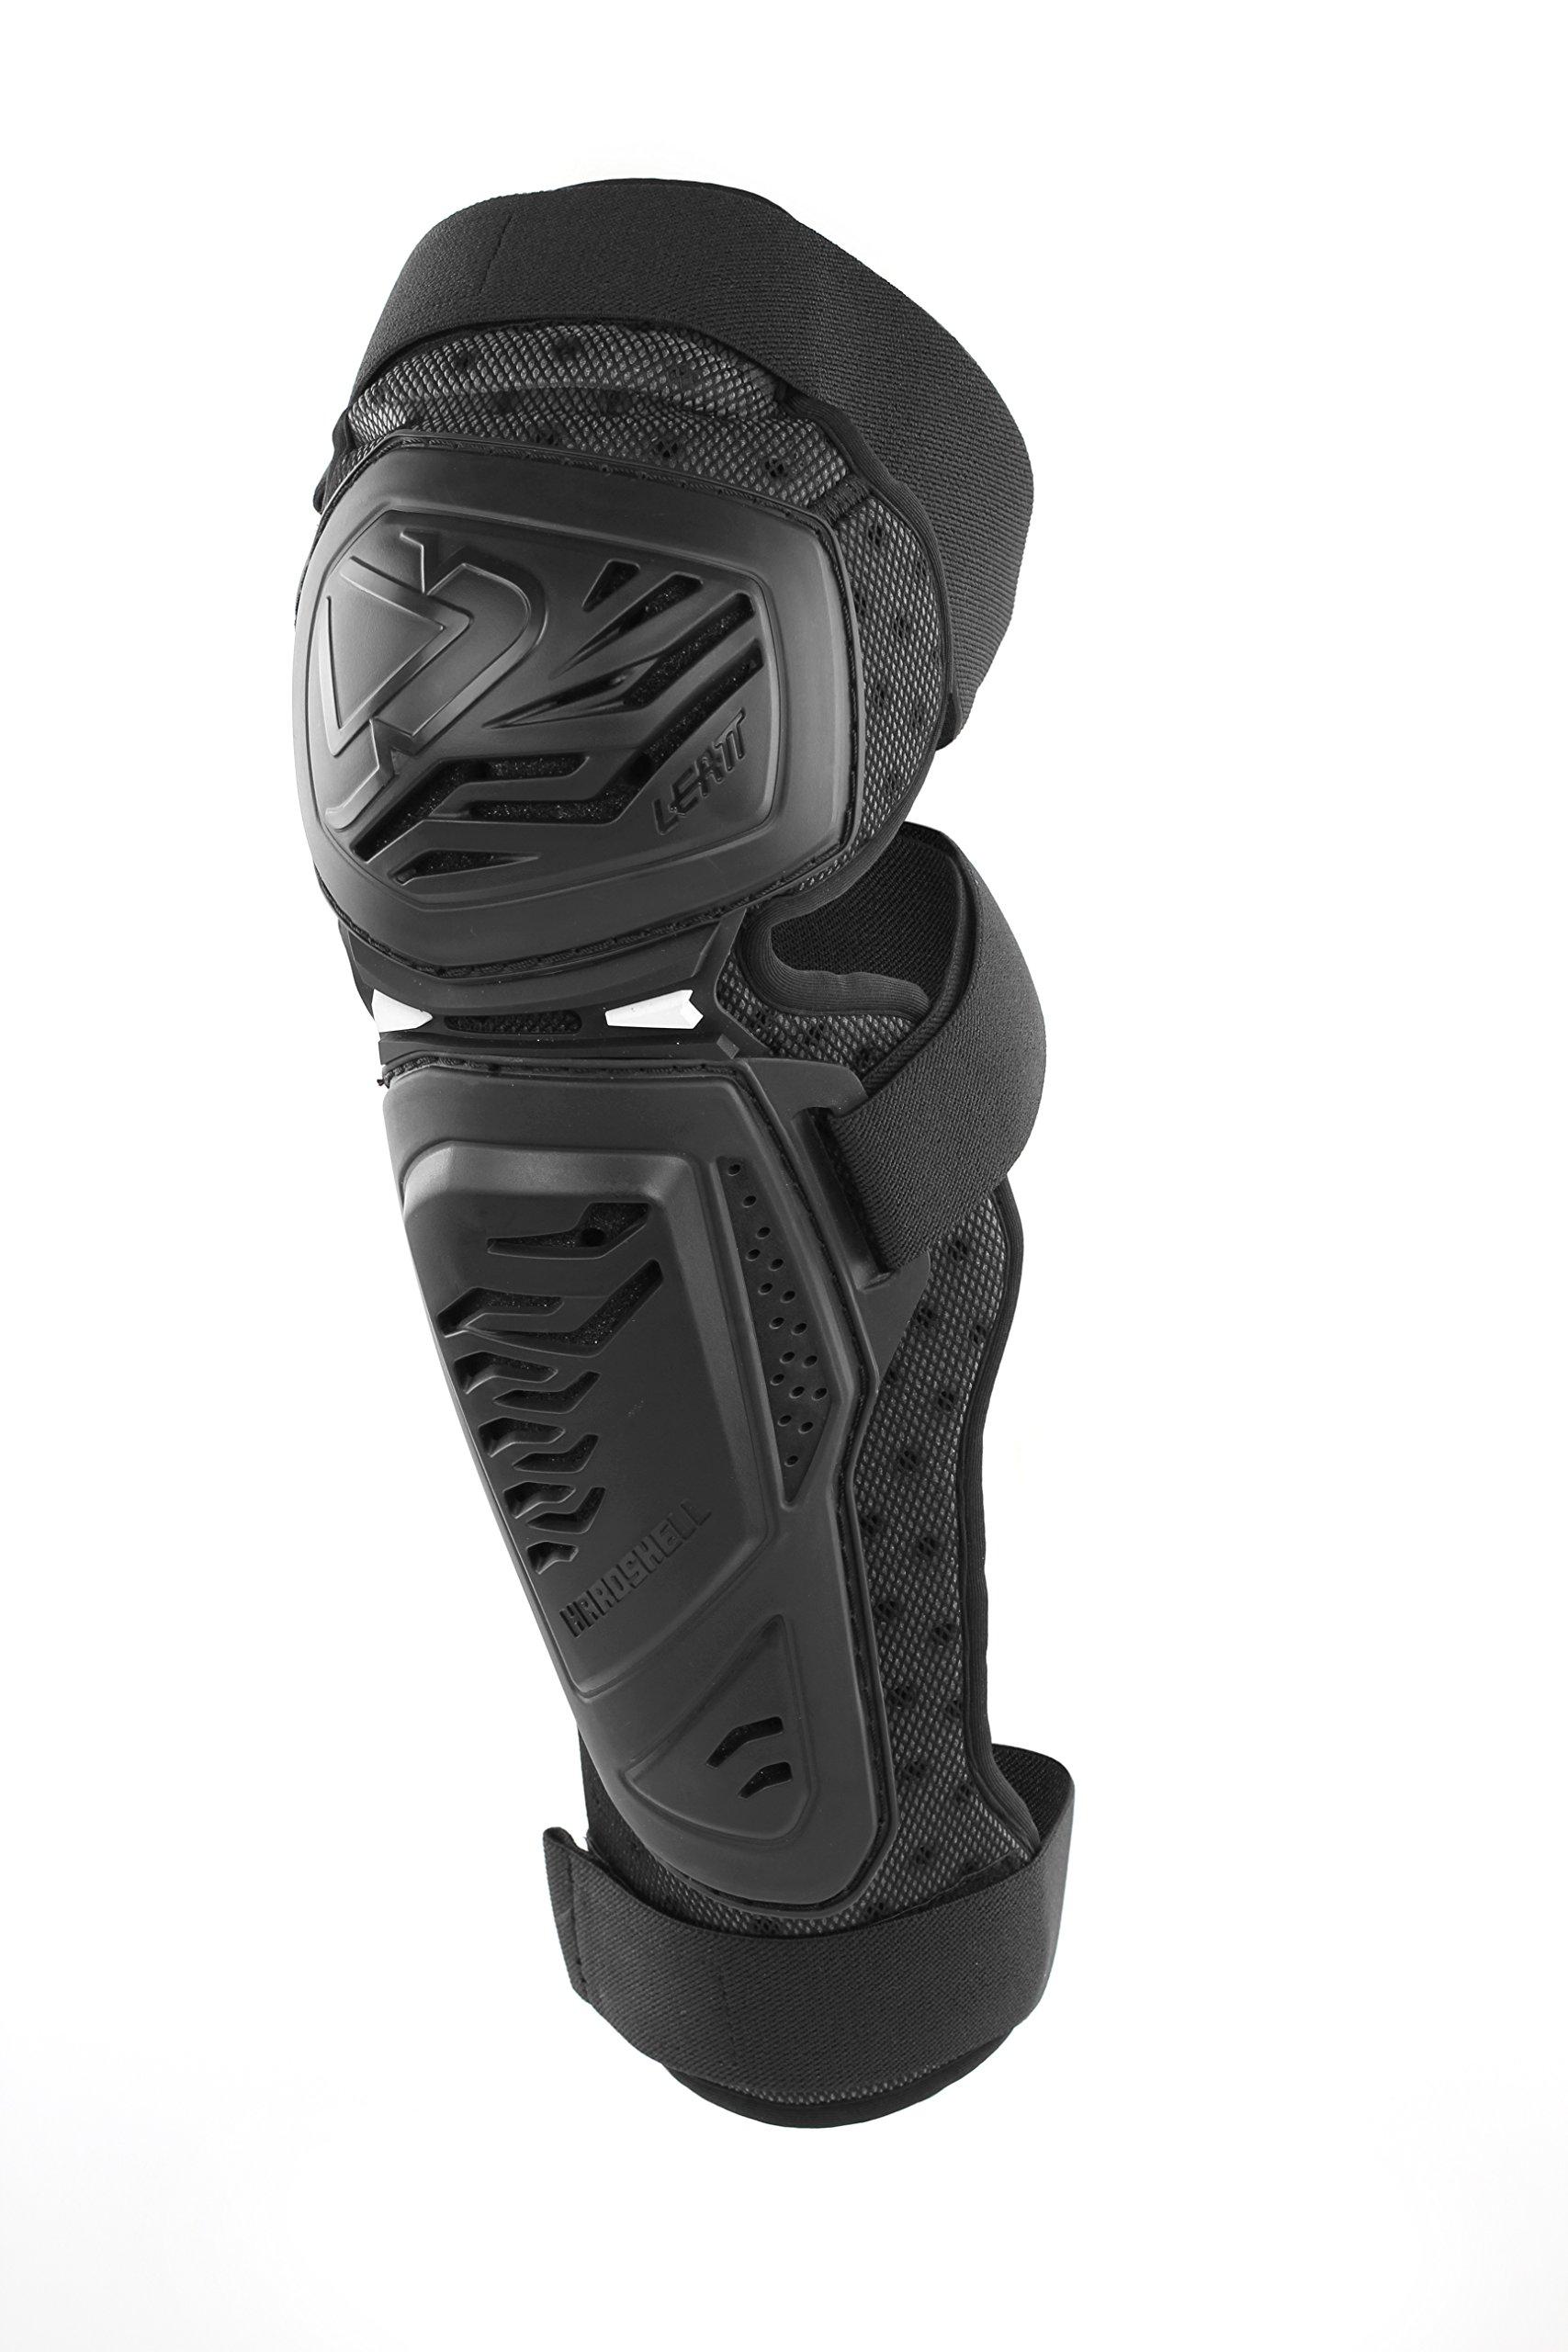 Leatt 3.0 EXT Knee and Shin Guard (Black, Large/X-Large) by Leatt Brace